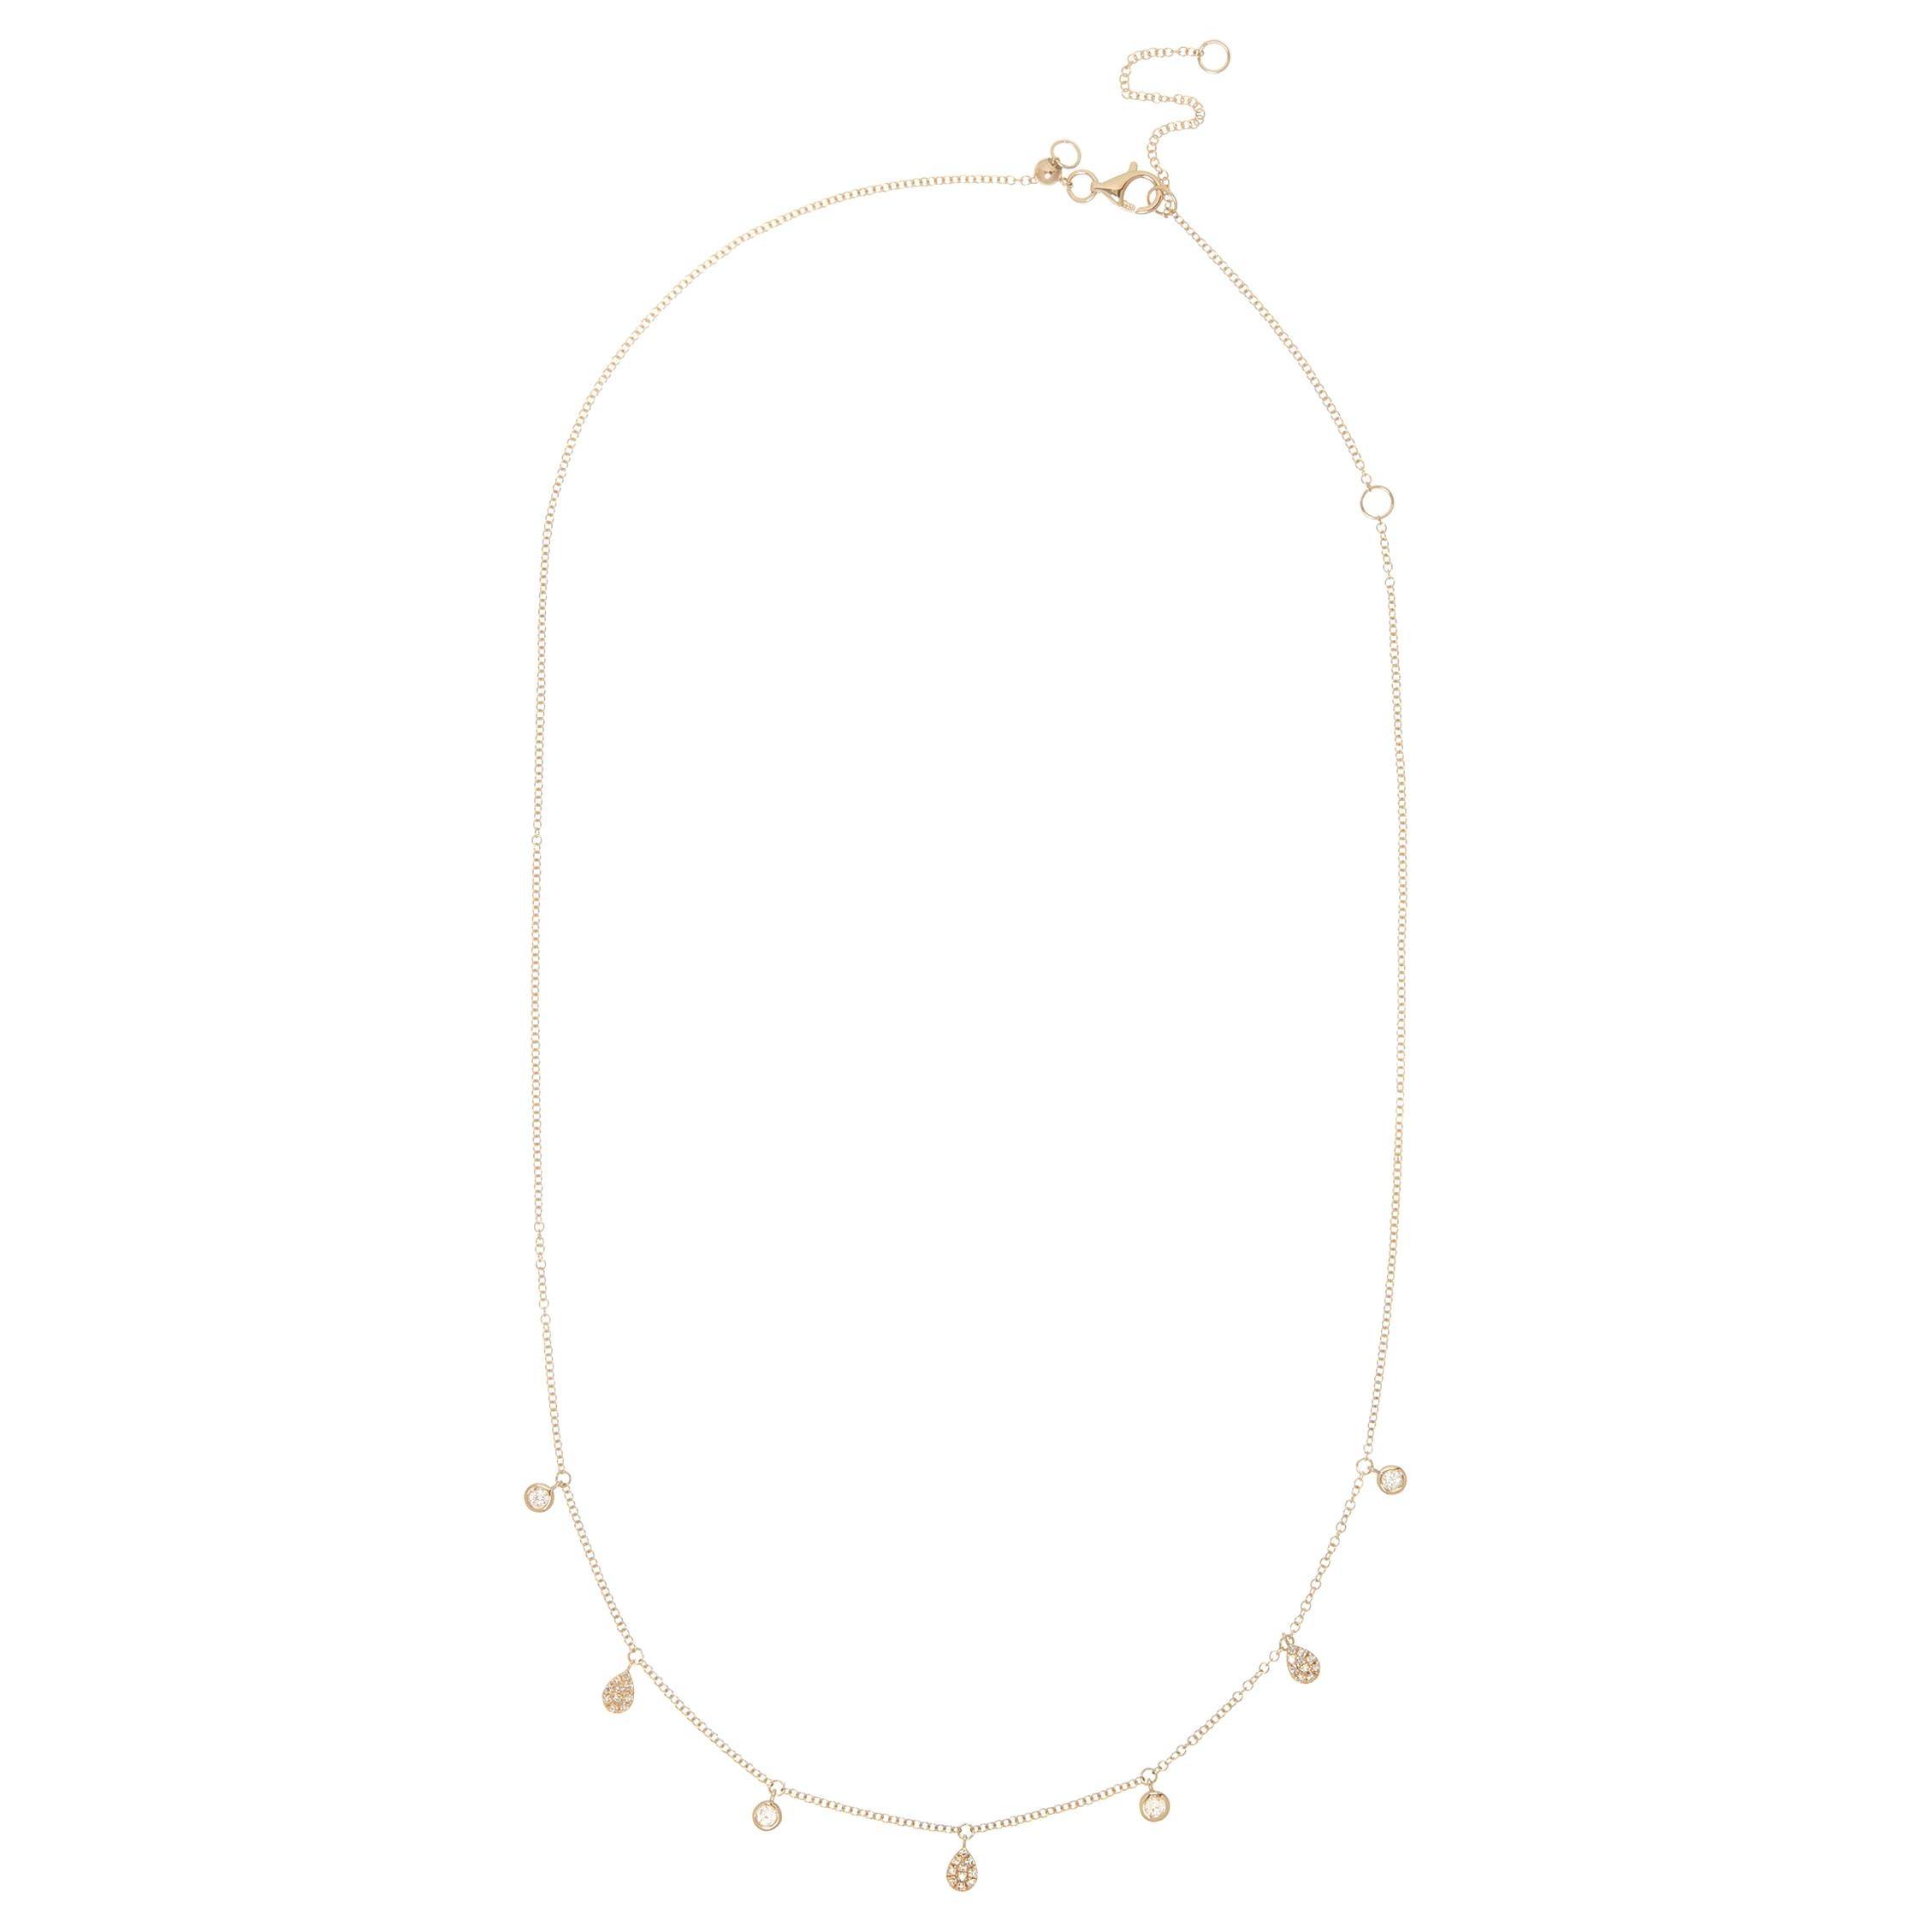 14 Karat Yellow Gold 0.217 Carat Round Diamond and Pear-Shape Pave Chain Pendant